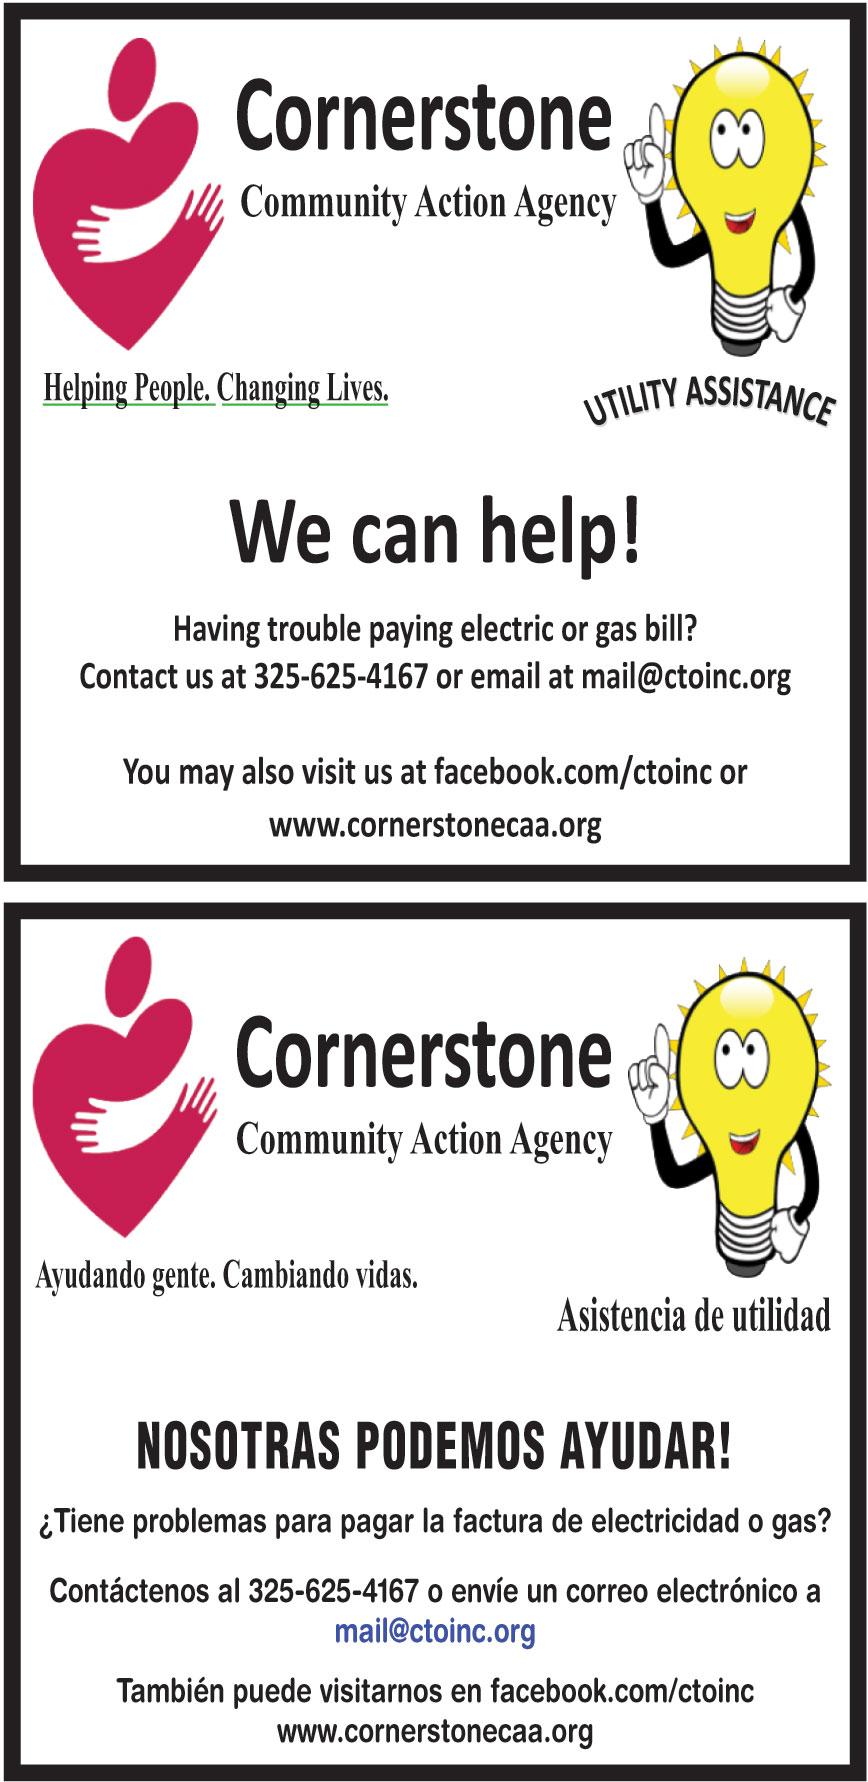 CORNERSTONE COMMUNITY